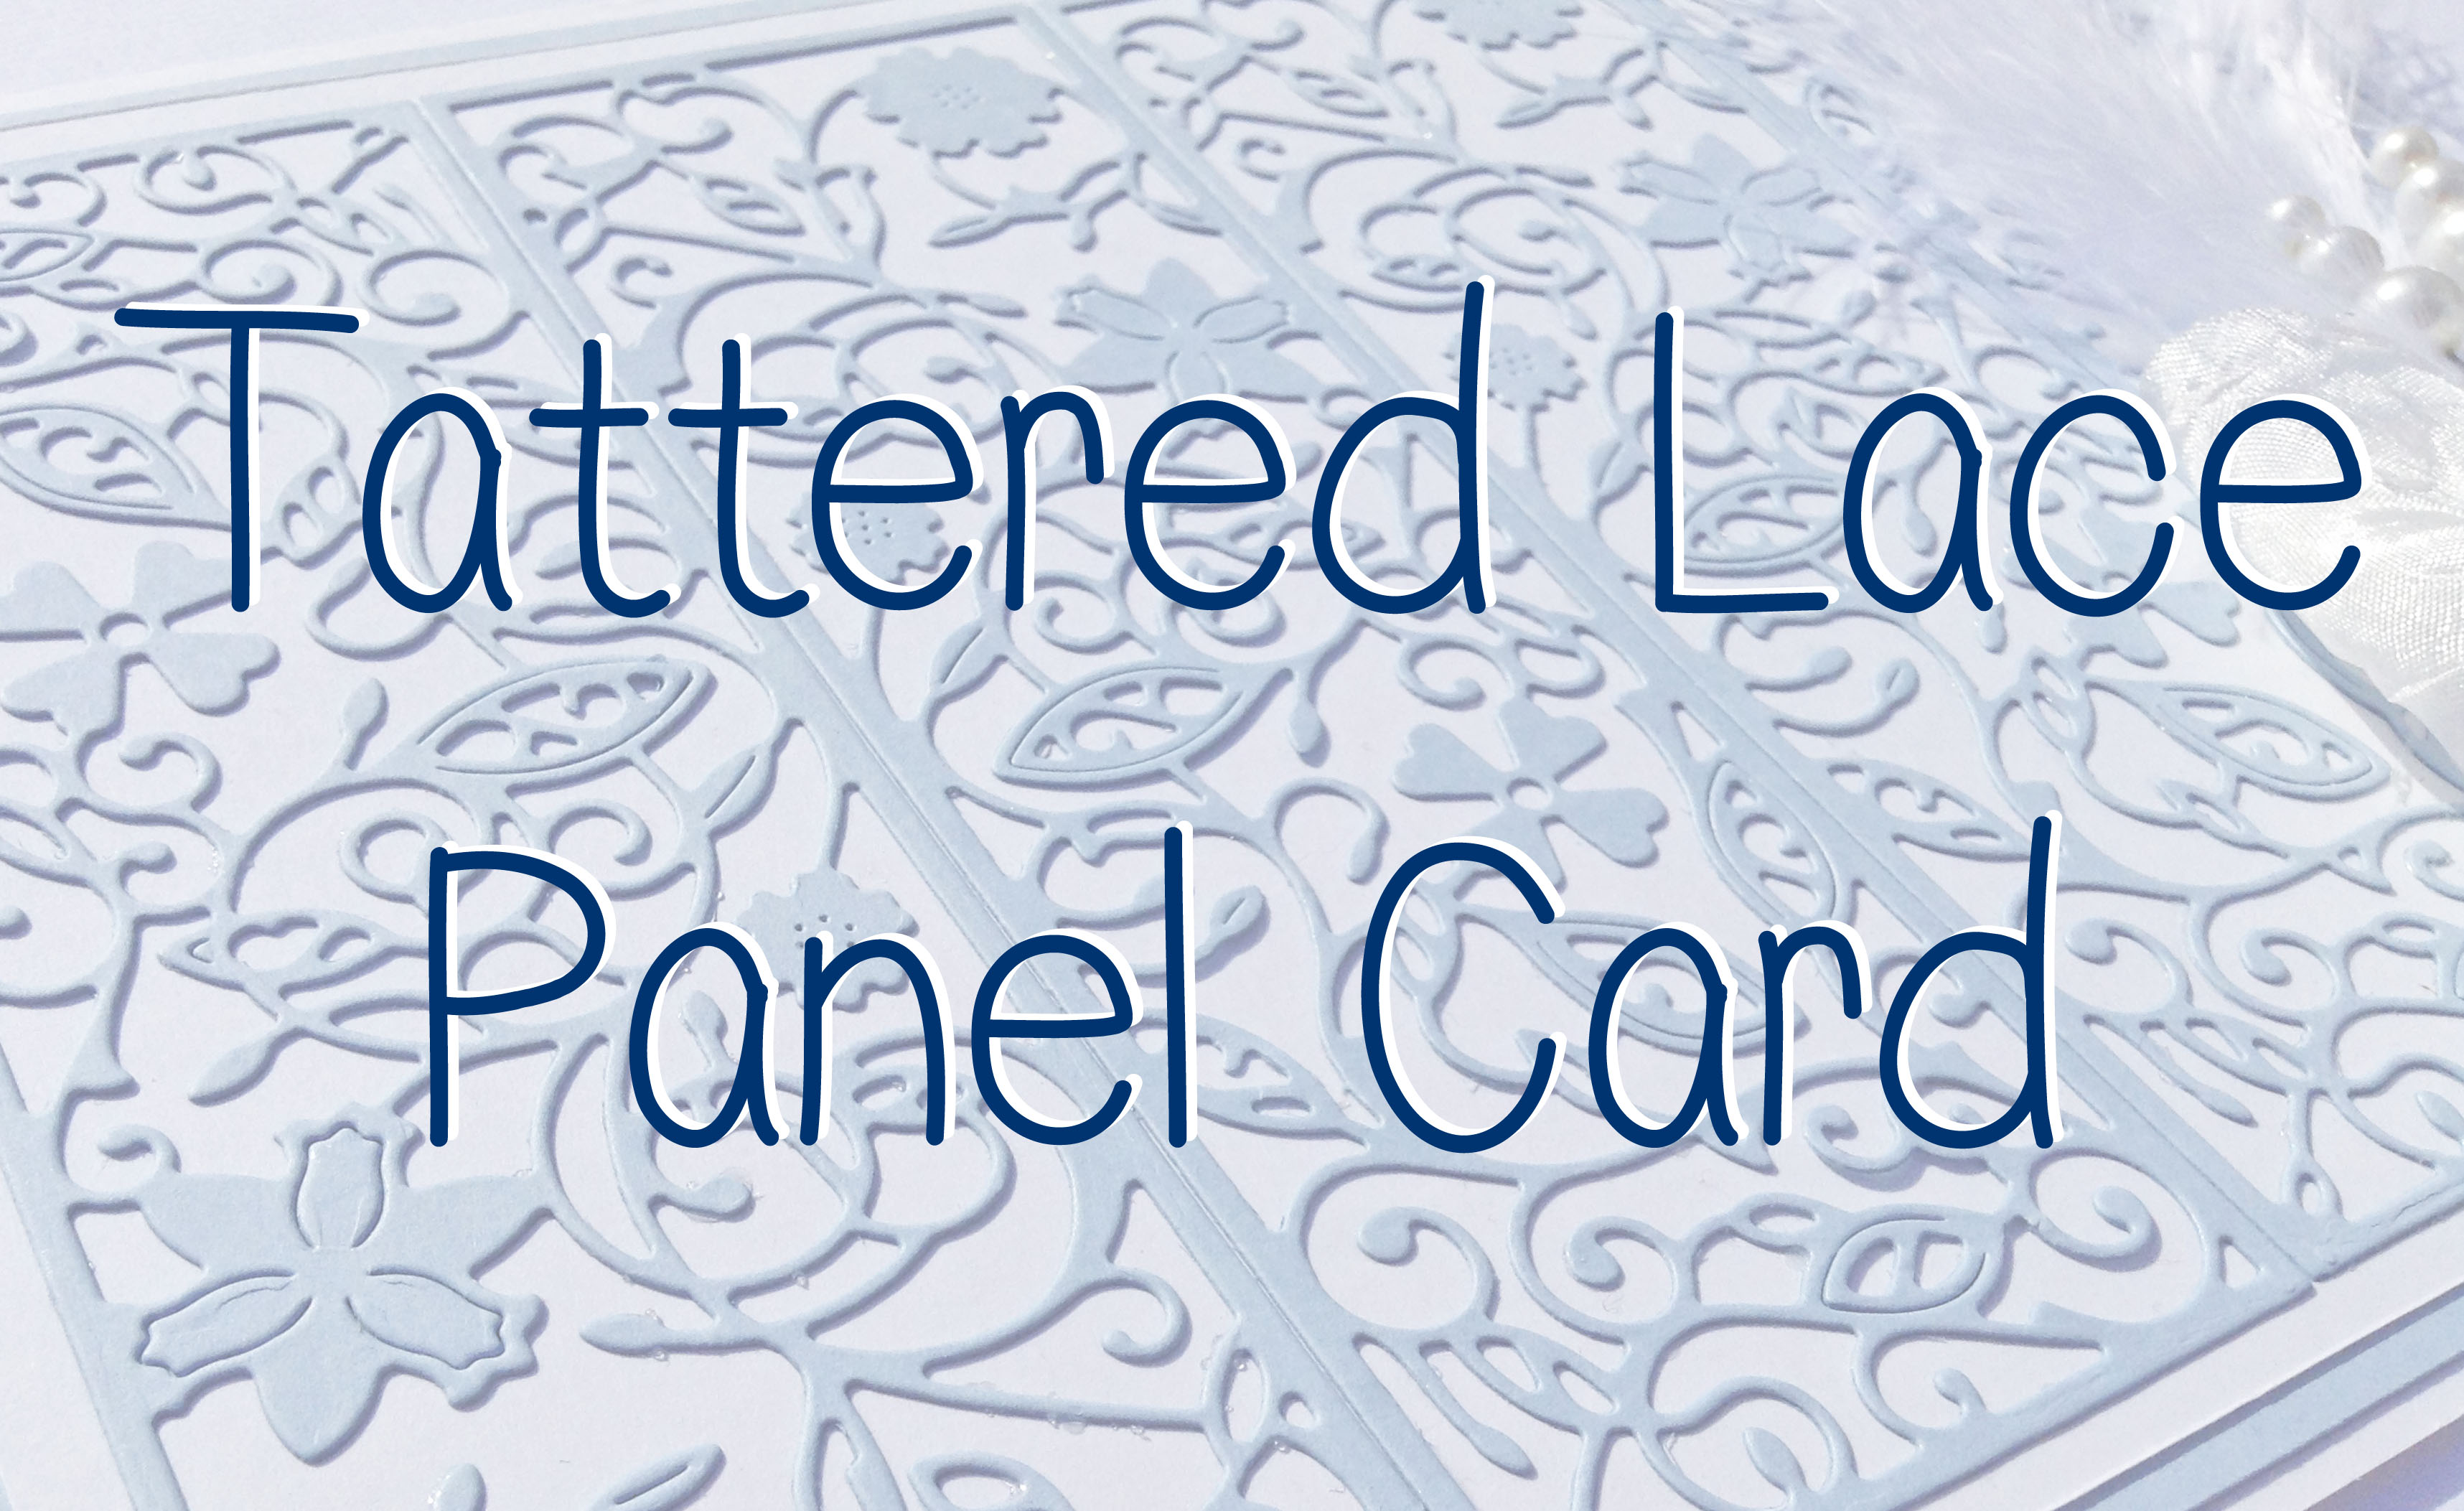 Tattered Panel